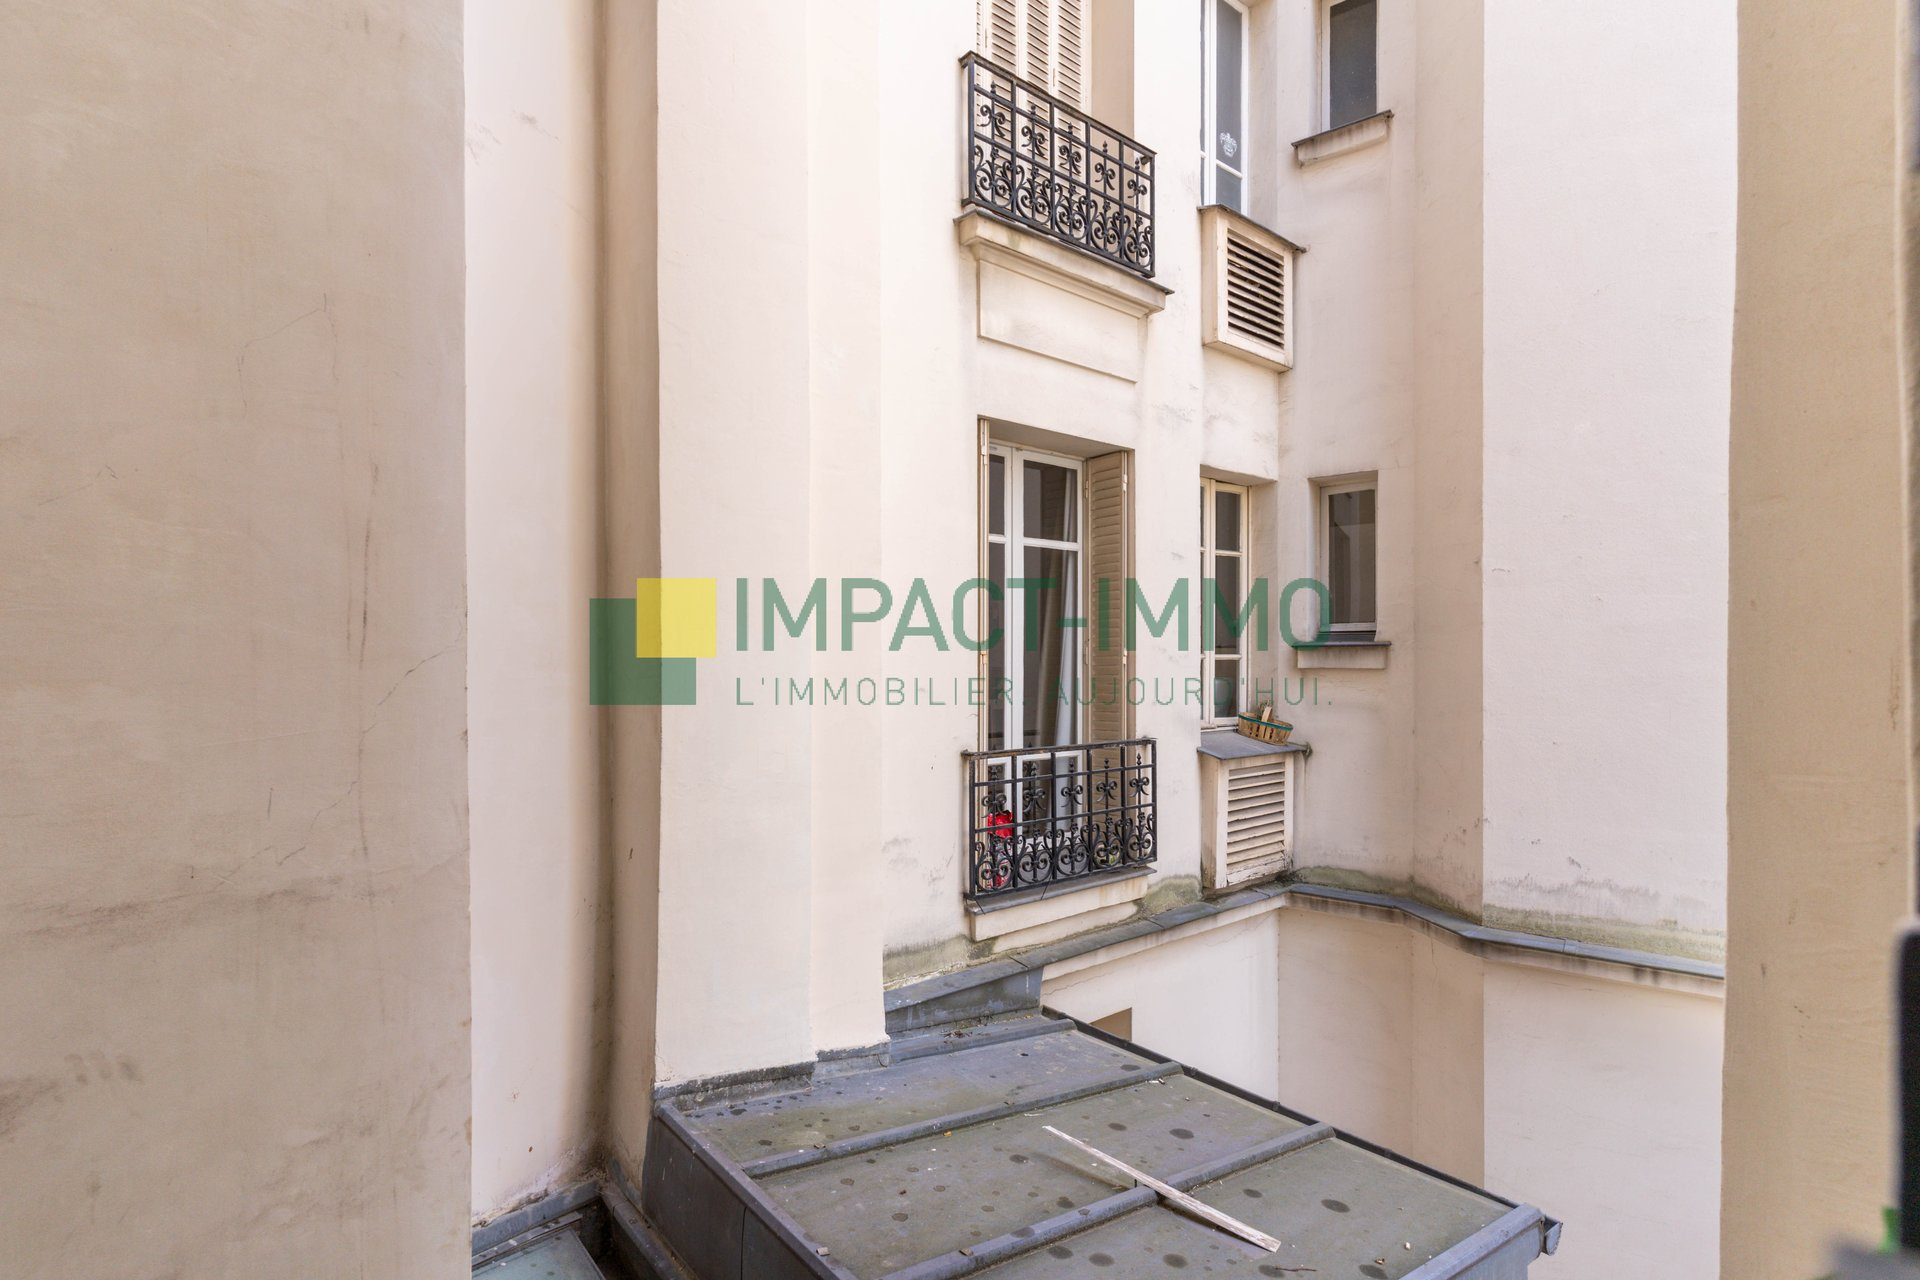 STUDIO - LUMINEUX - CAMBRONNE - PARIS 15